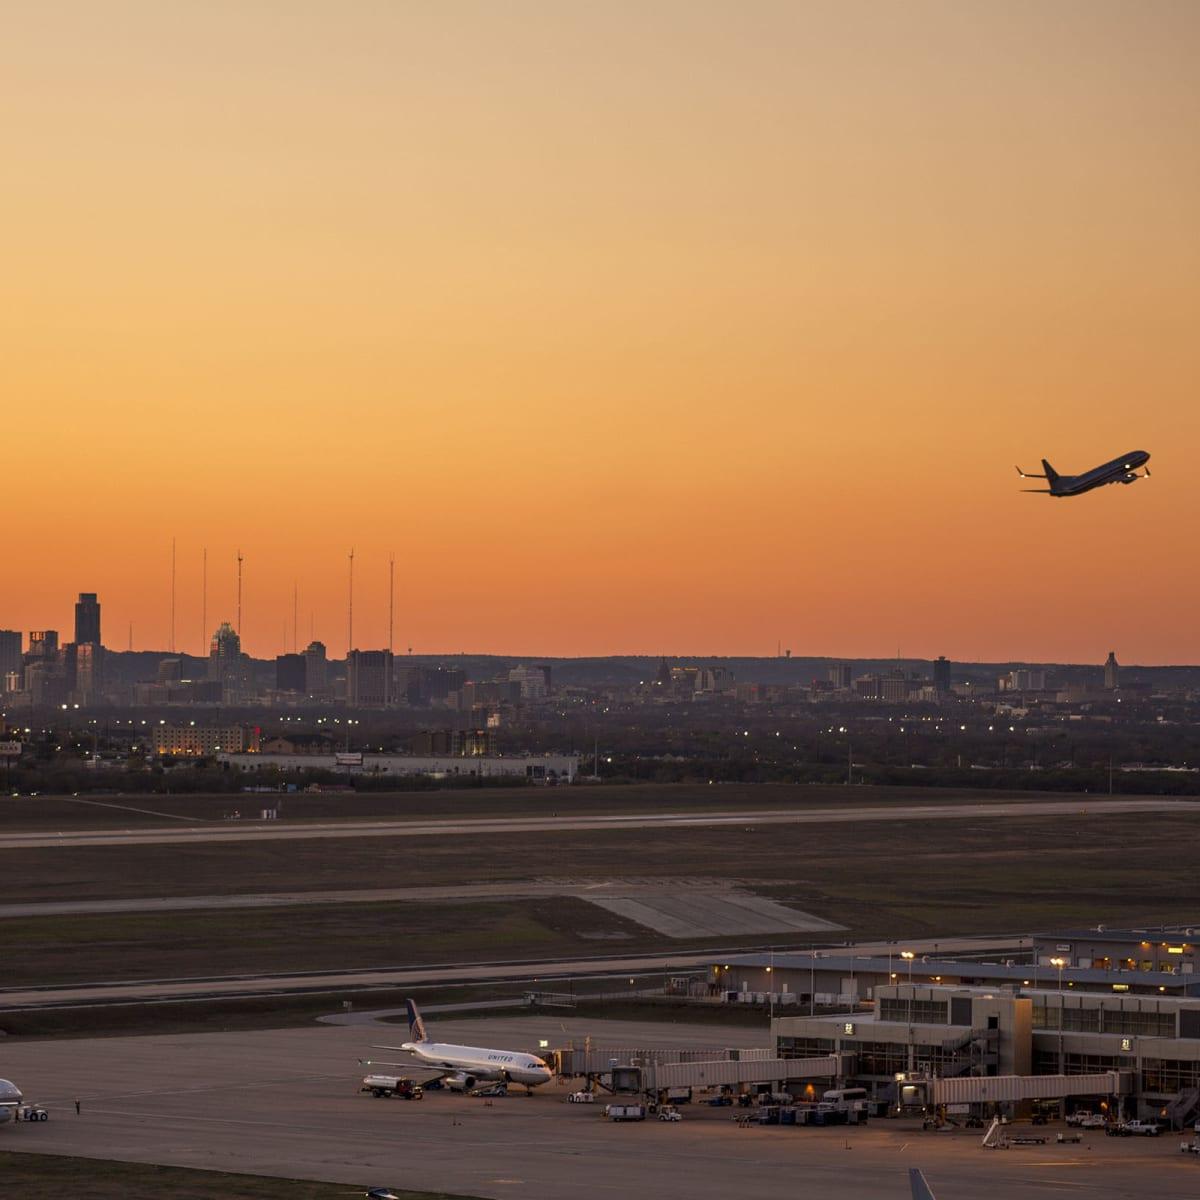 Austin-Bergstrom International Airport ABIA